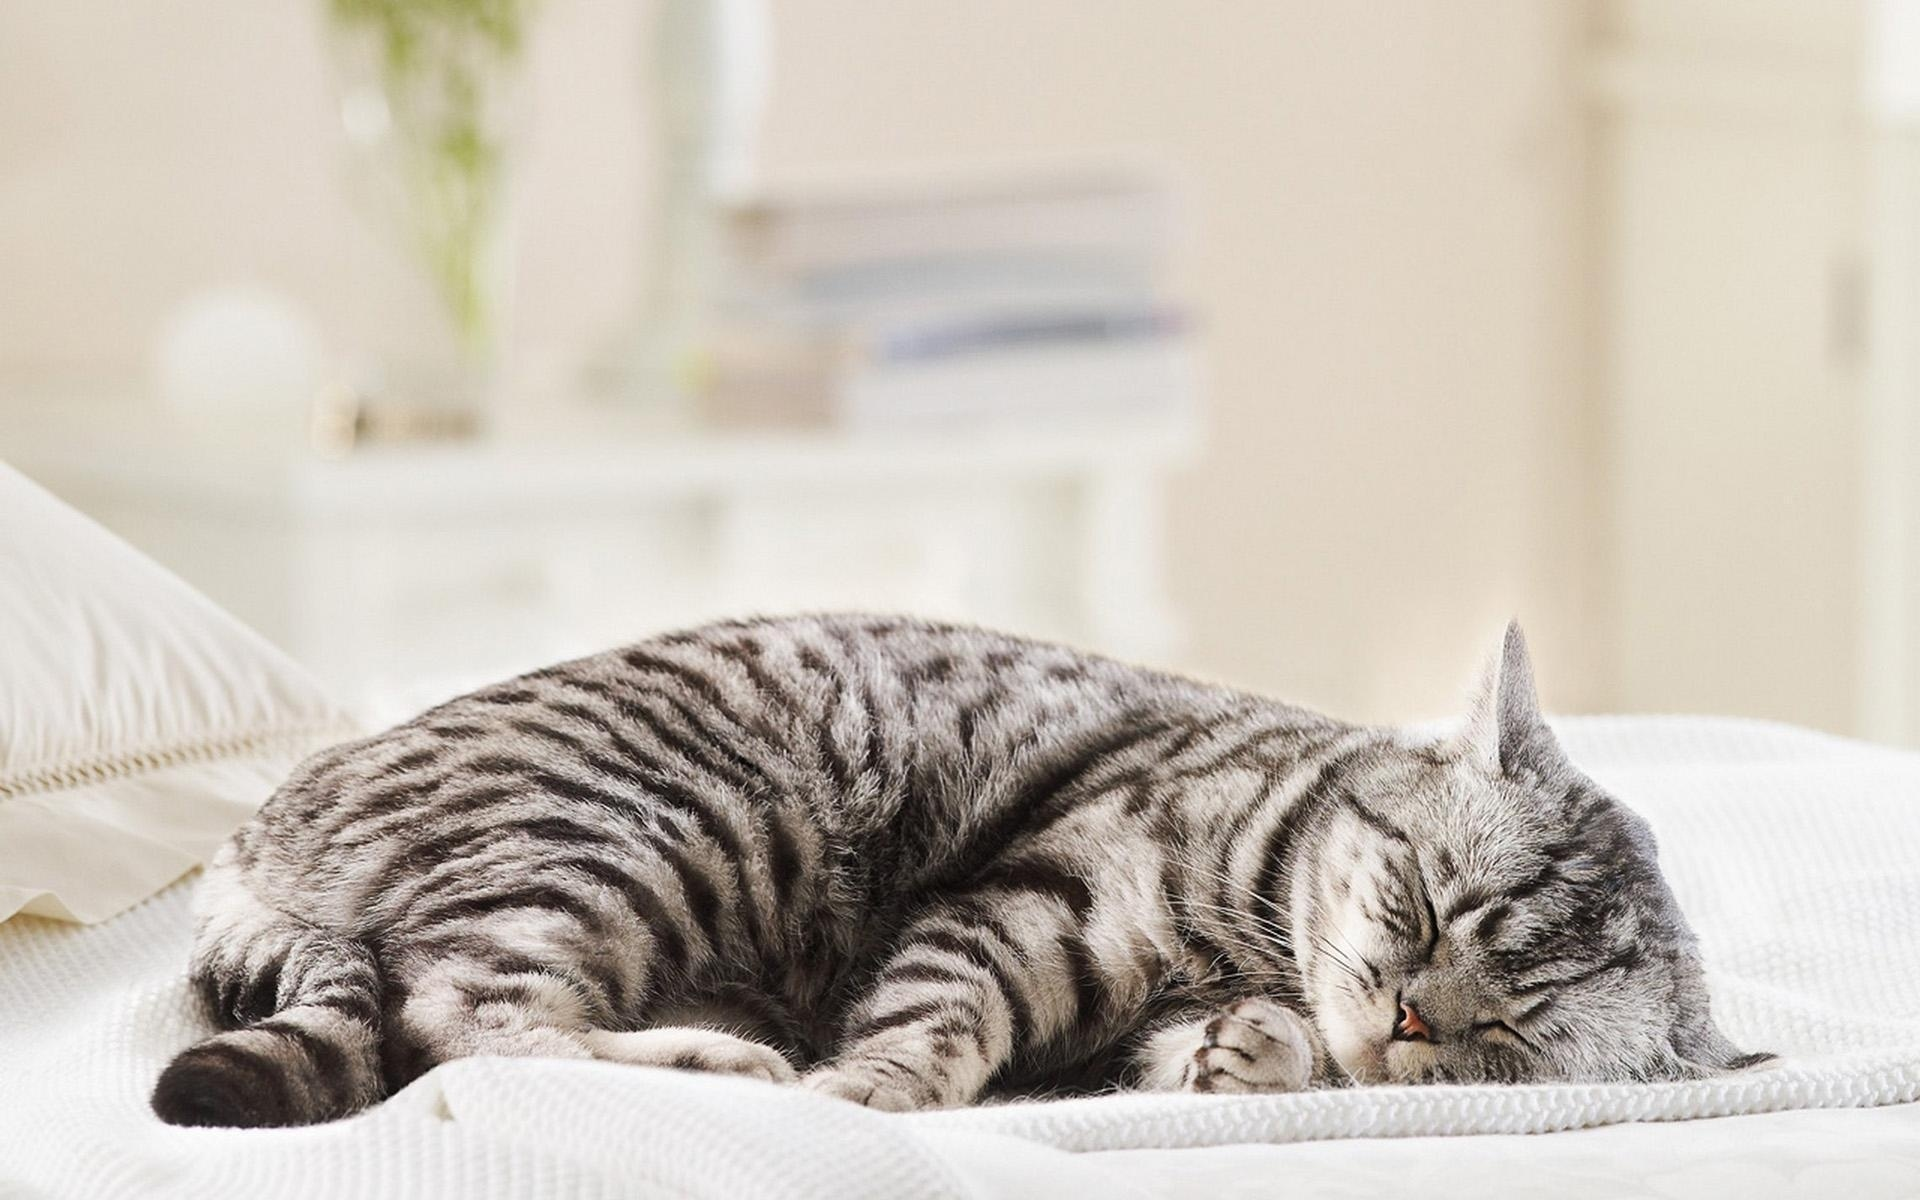 Sleeping Cat Wallpaper 40312 1920x1200px 1920x1200